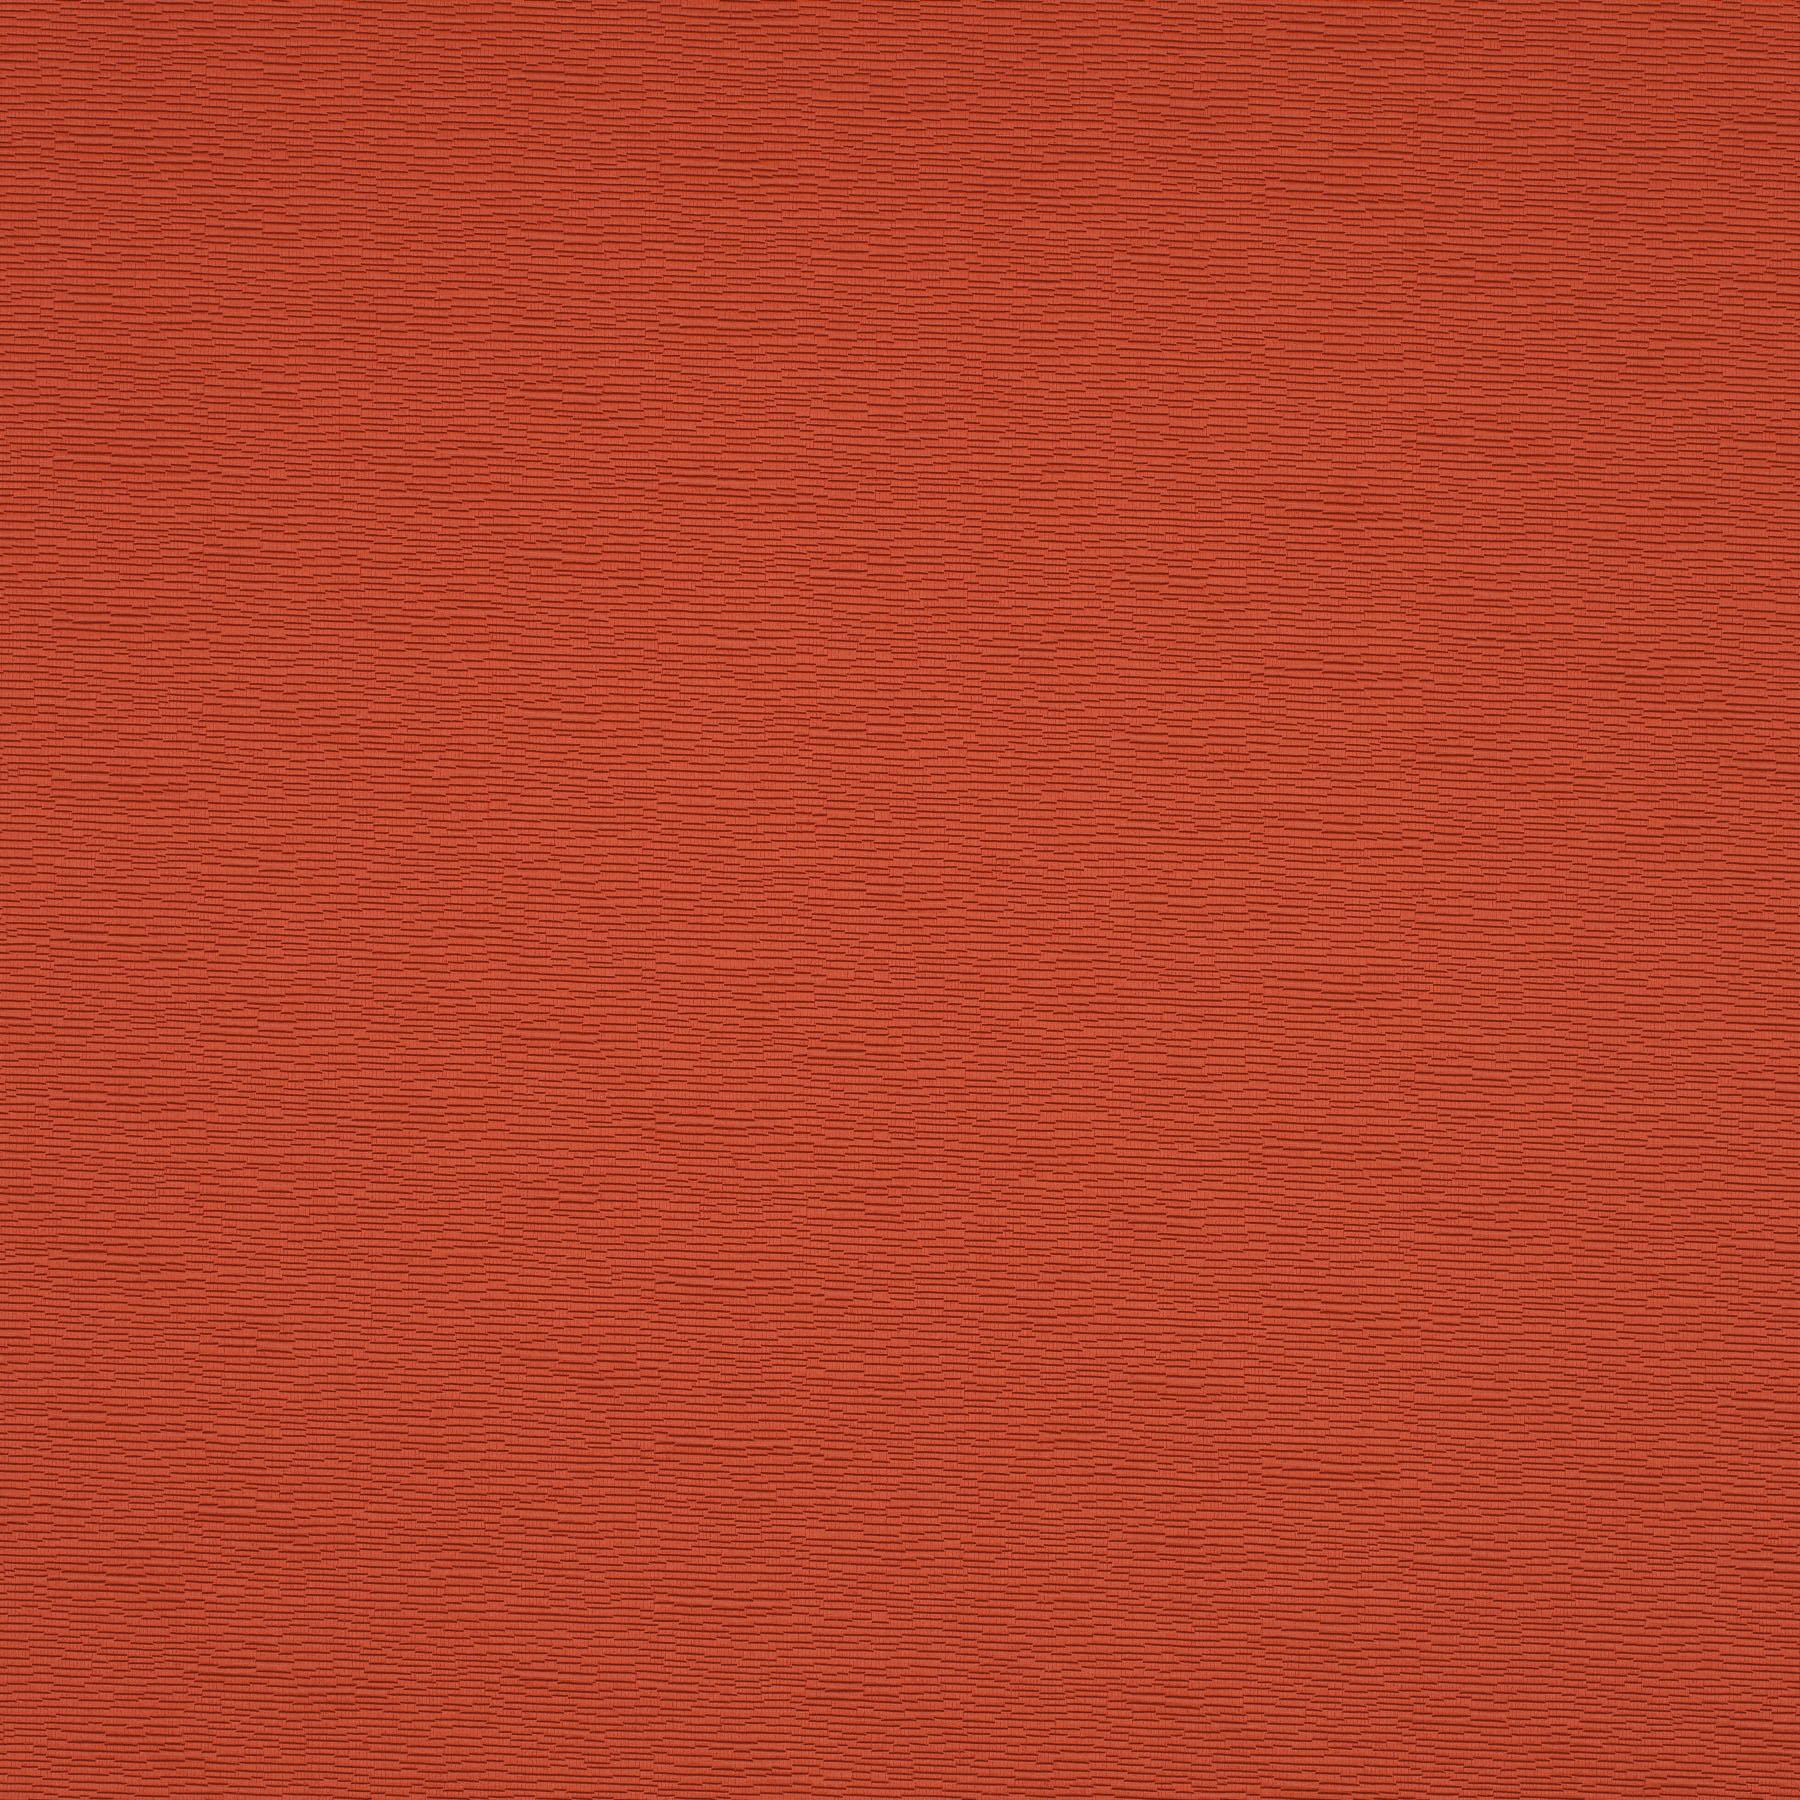 decoration fabric harris 1 6748 063 jab anstoetz fabrics. Black Bedroom Furniture Sets. Home Design Ideas